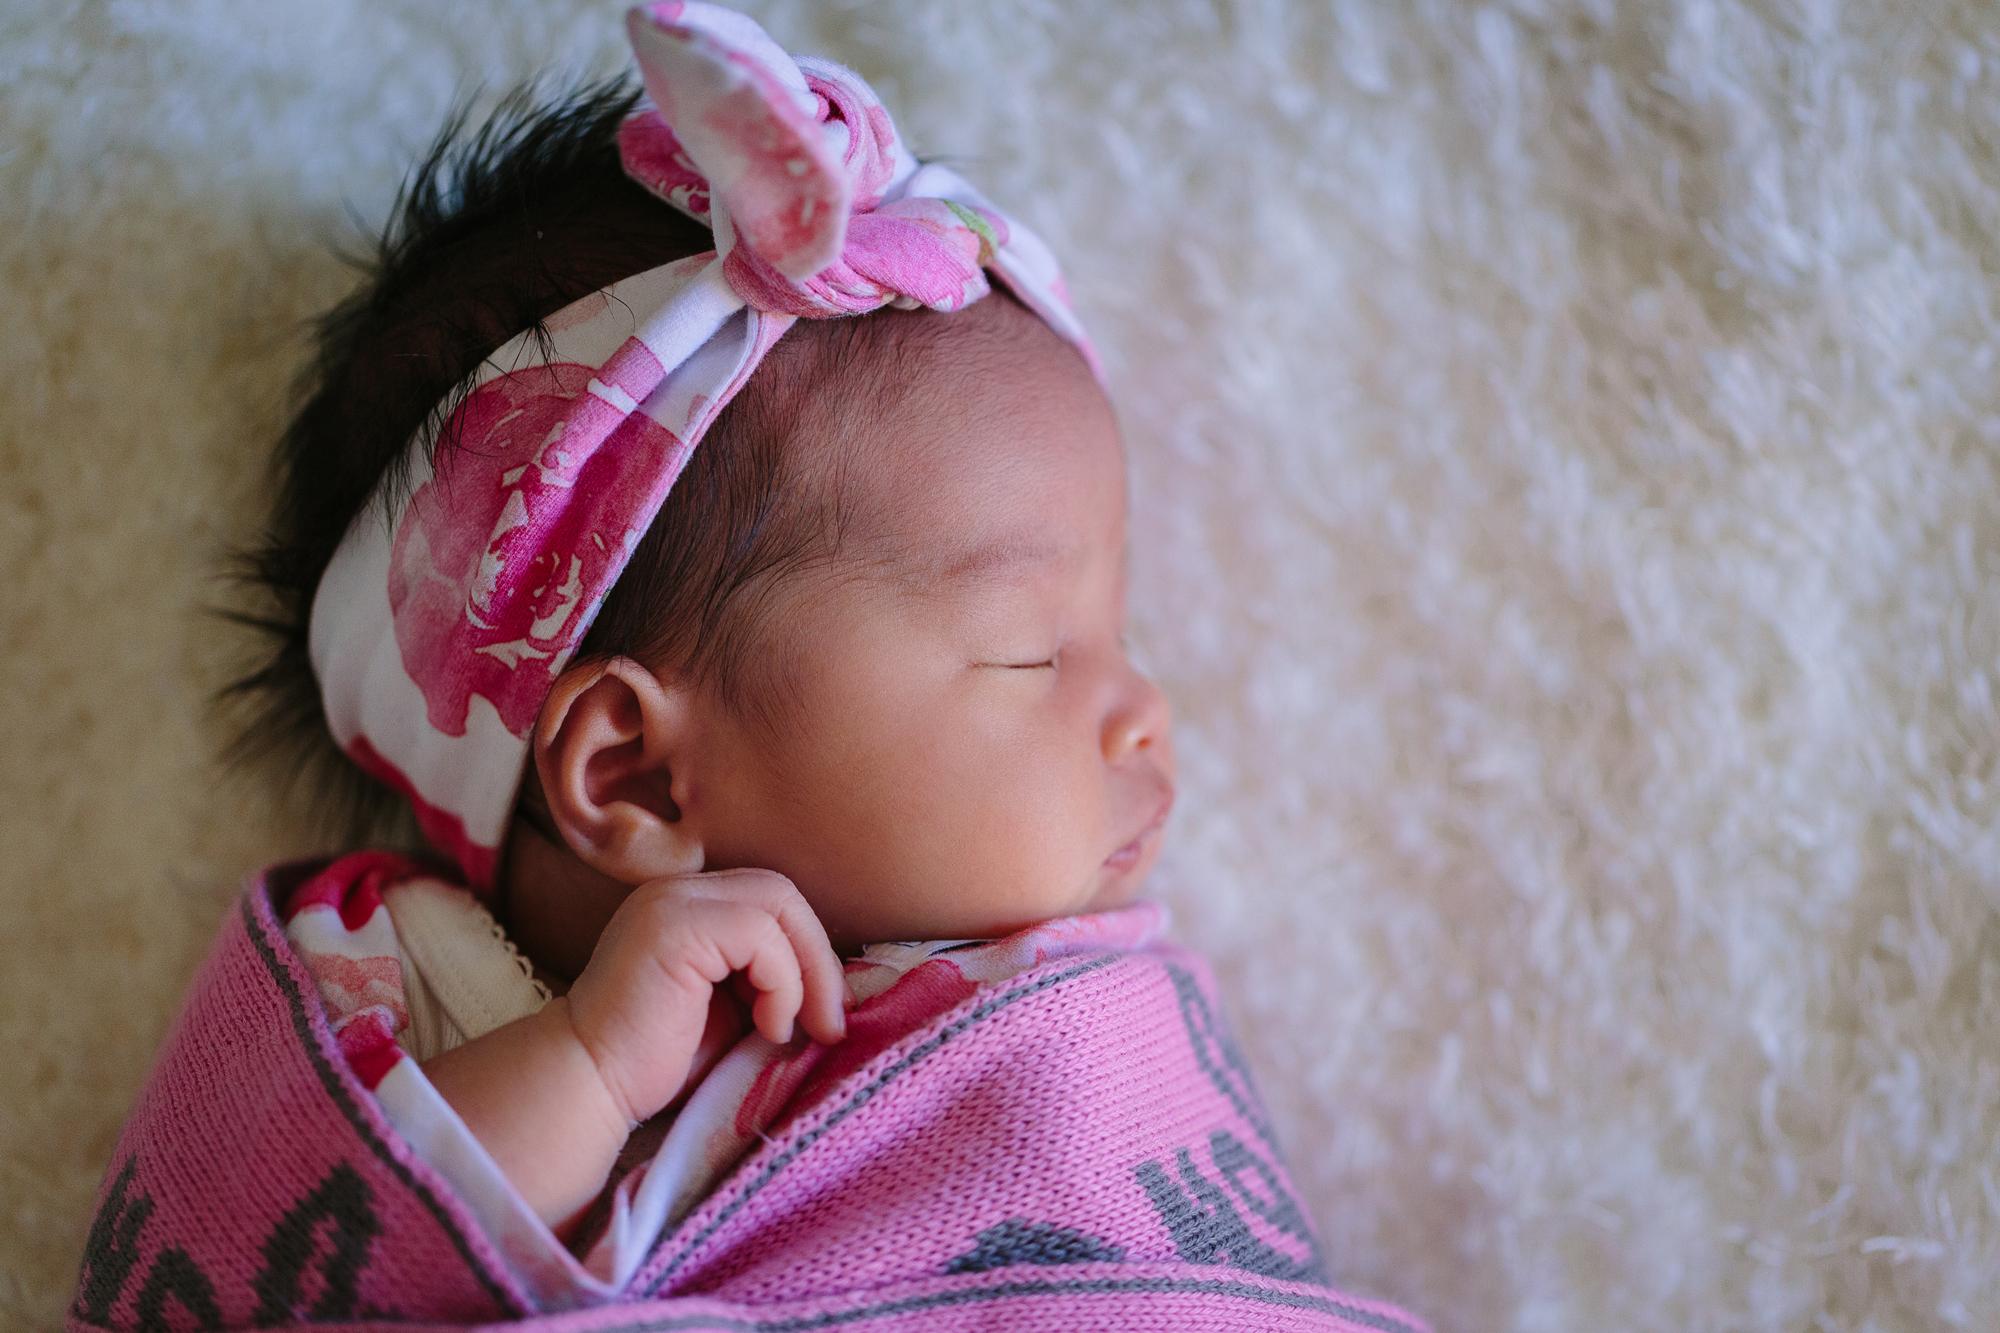 003_Newborn Lifetsyle_Zara_Sunlight Photography.jpg